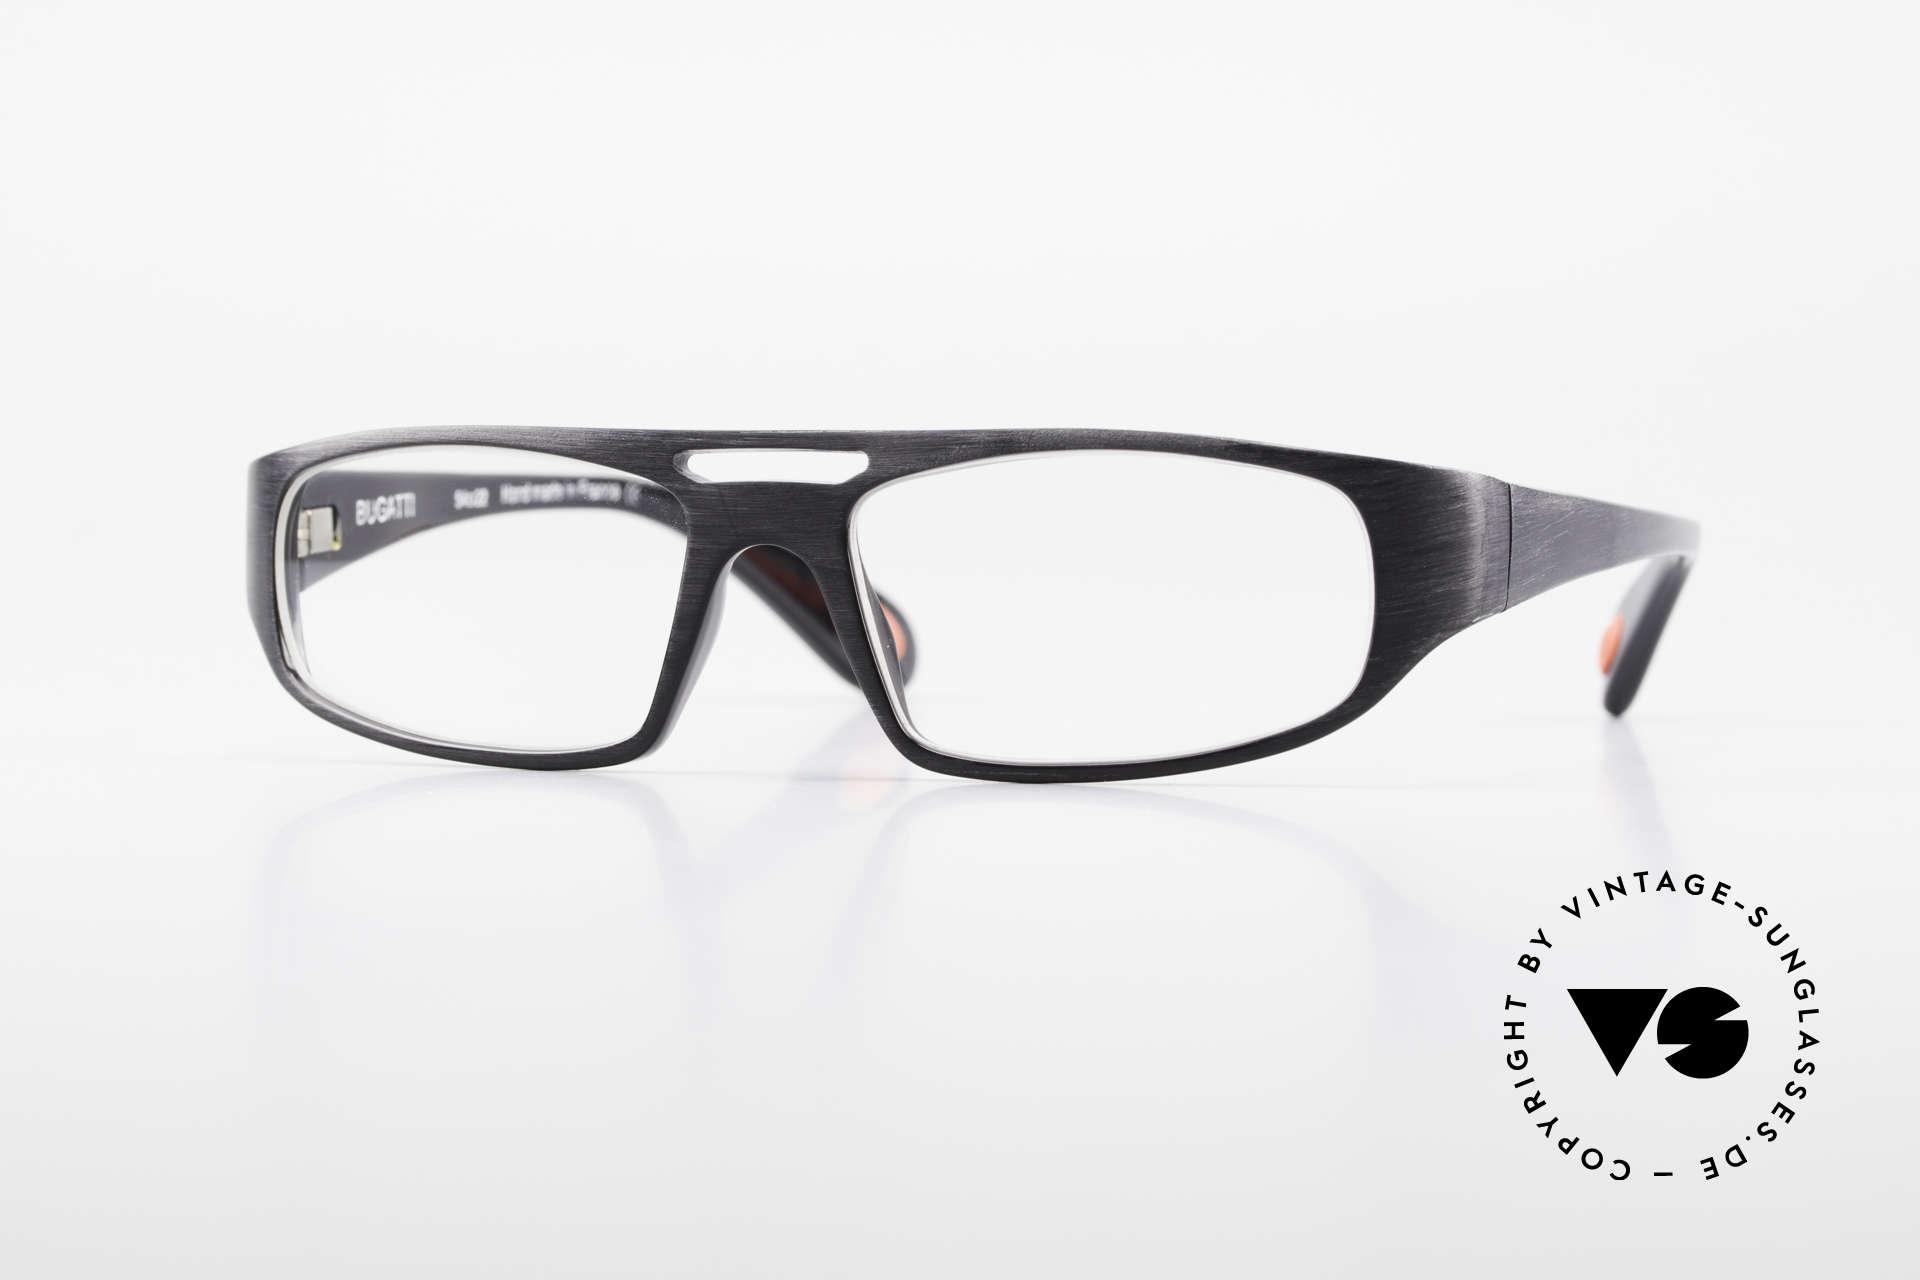 Bugatti 222 Extraordinary Vintage Glasses, striking vintage eyeglass-frame by BUGATTI, Made for Men